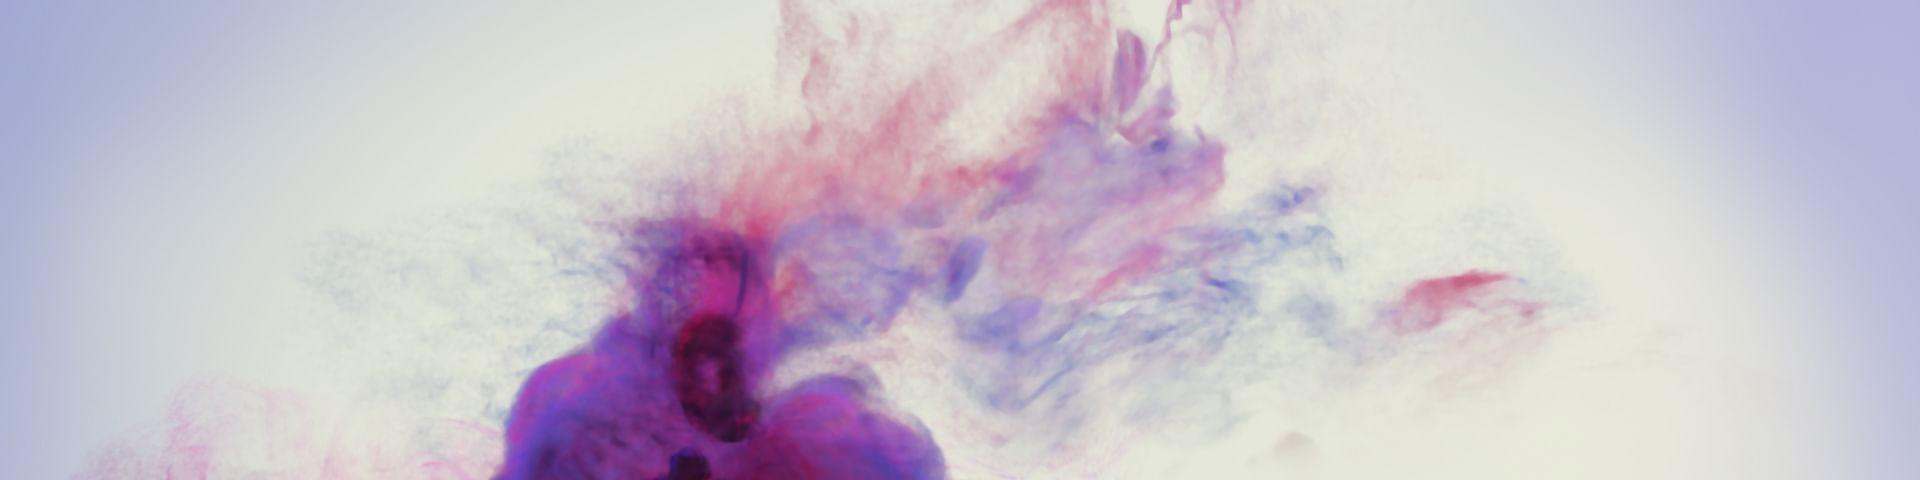 Xenius: Höhlen